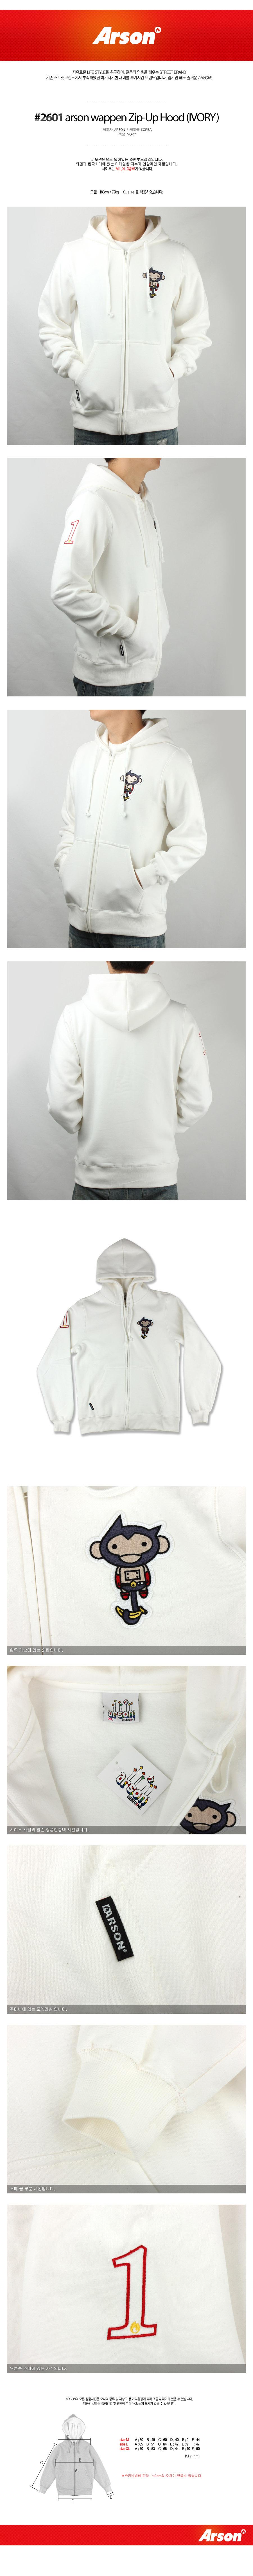 [ ARSON ] [ARSON] J2601 arson HOOD TEE zip up hoodie